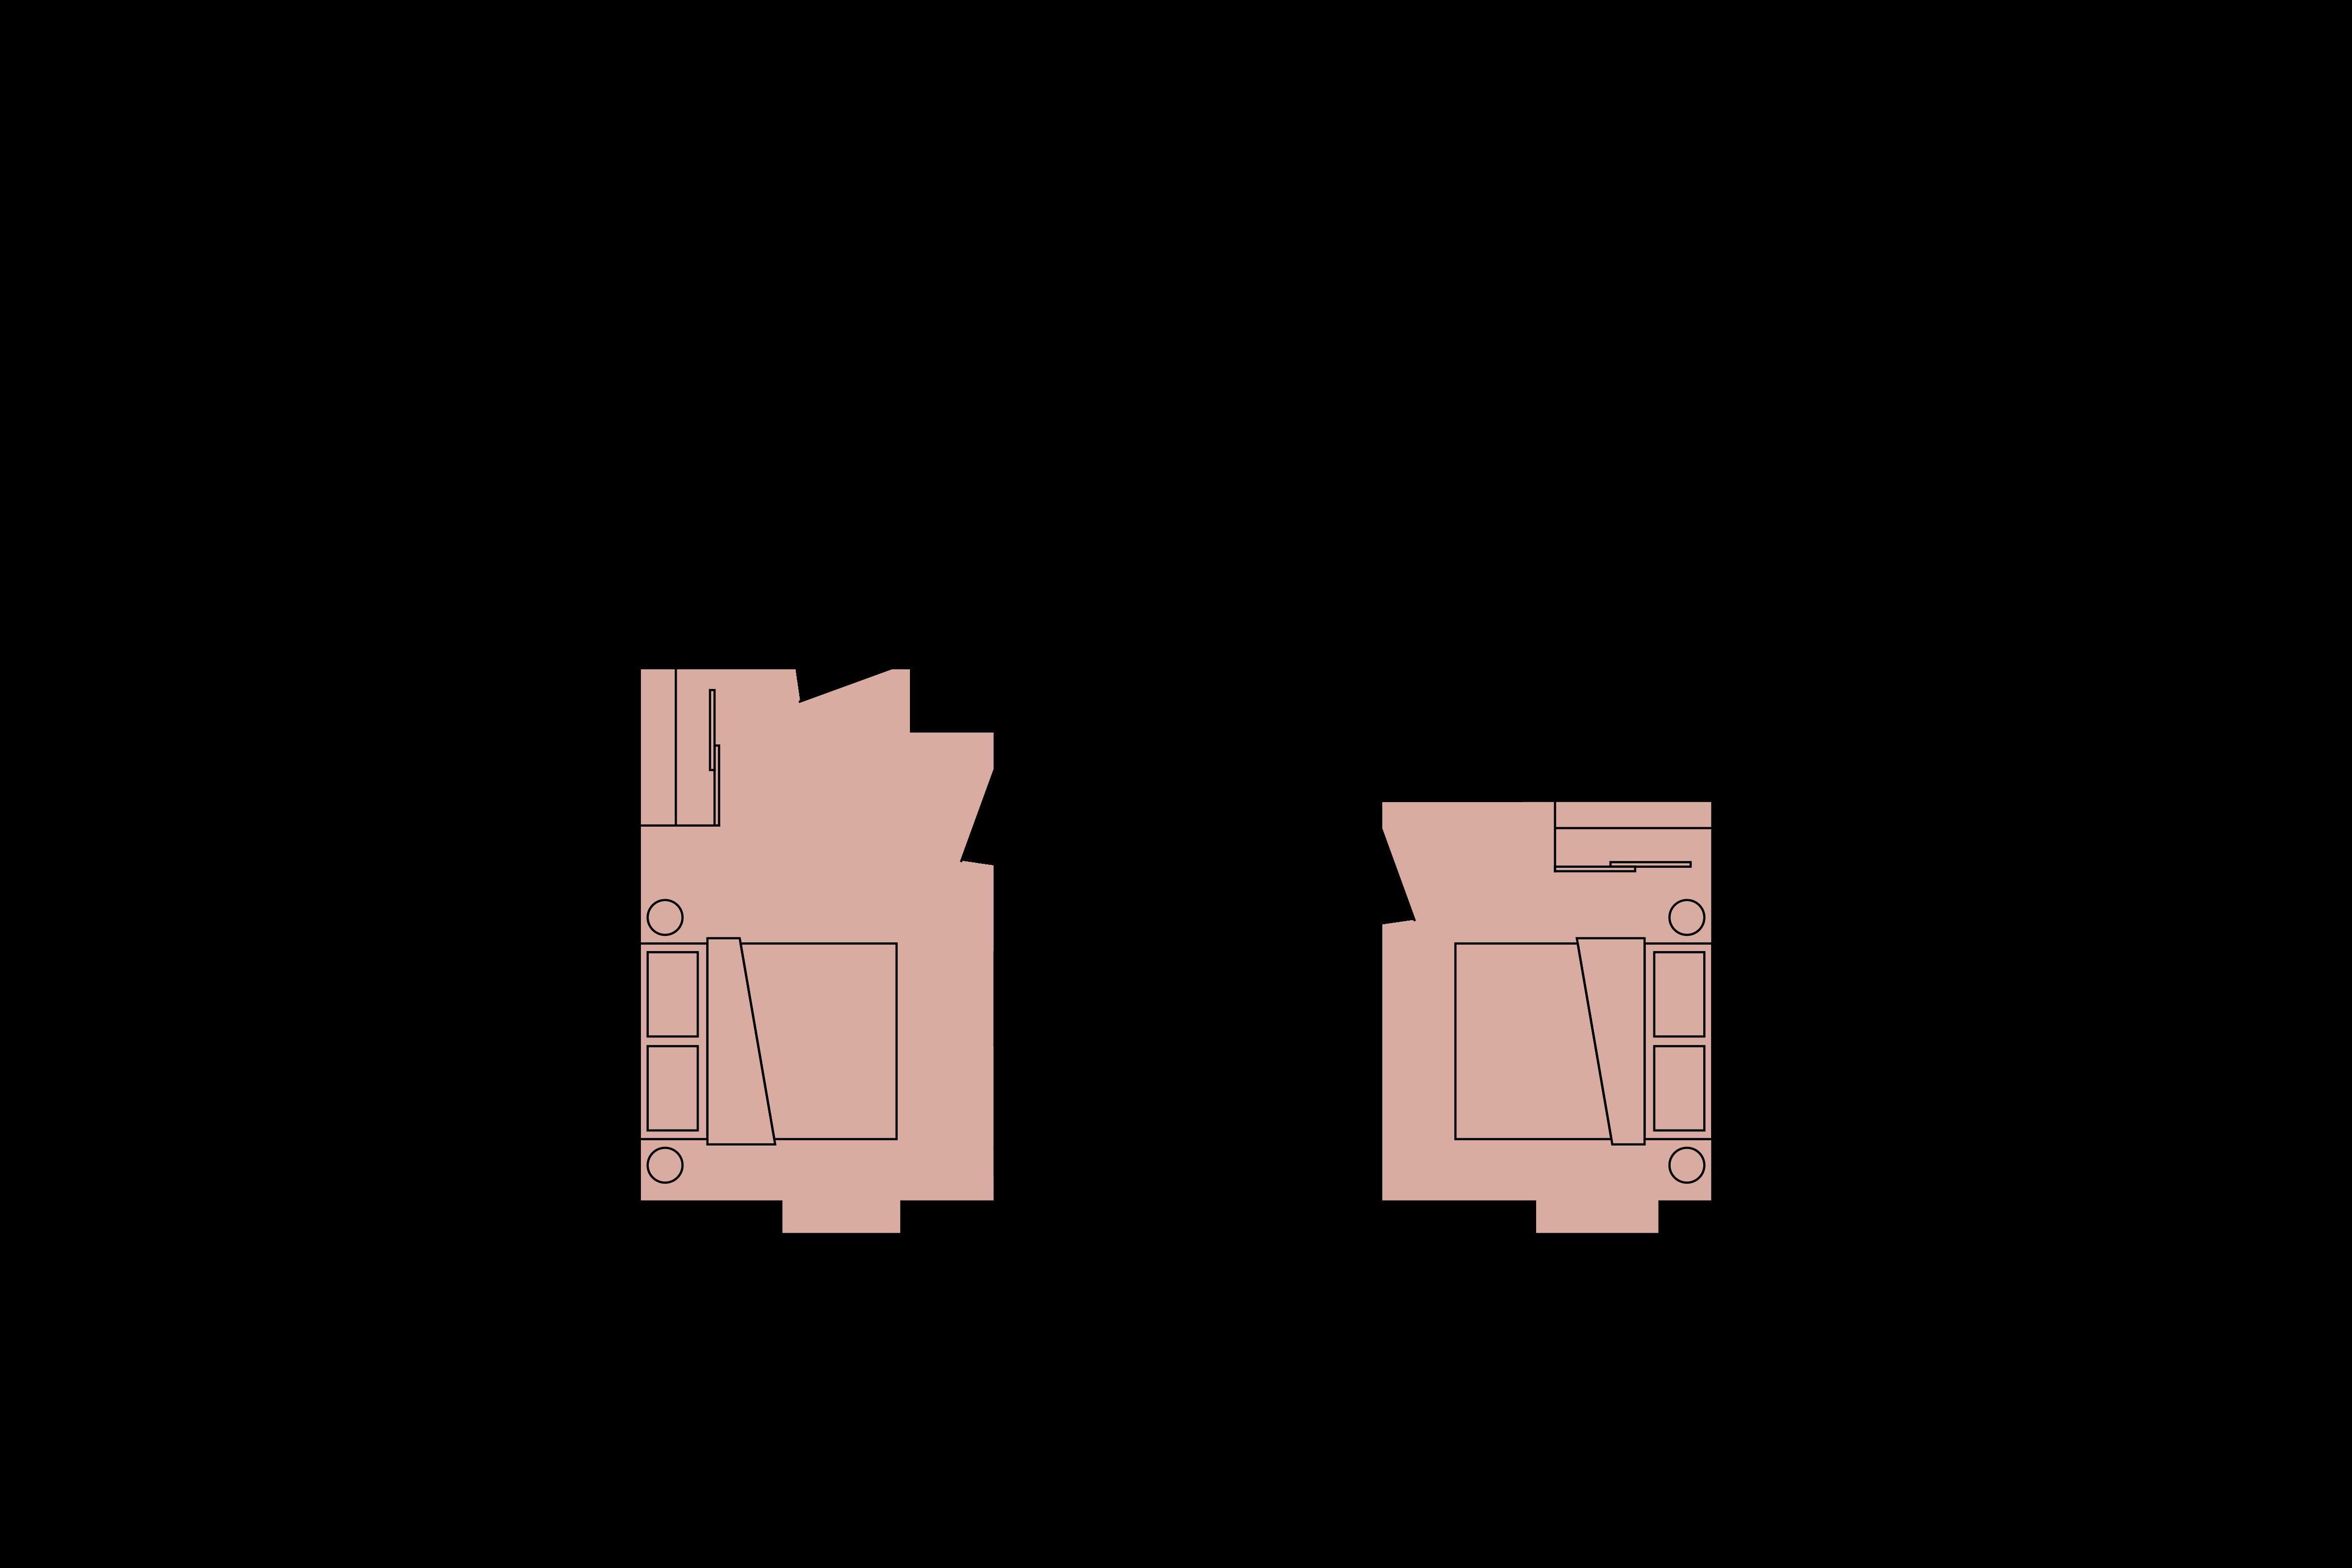 Floor plan for 2 Bed – North Block